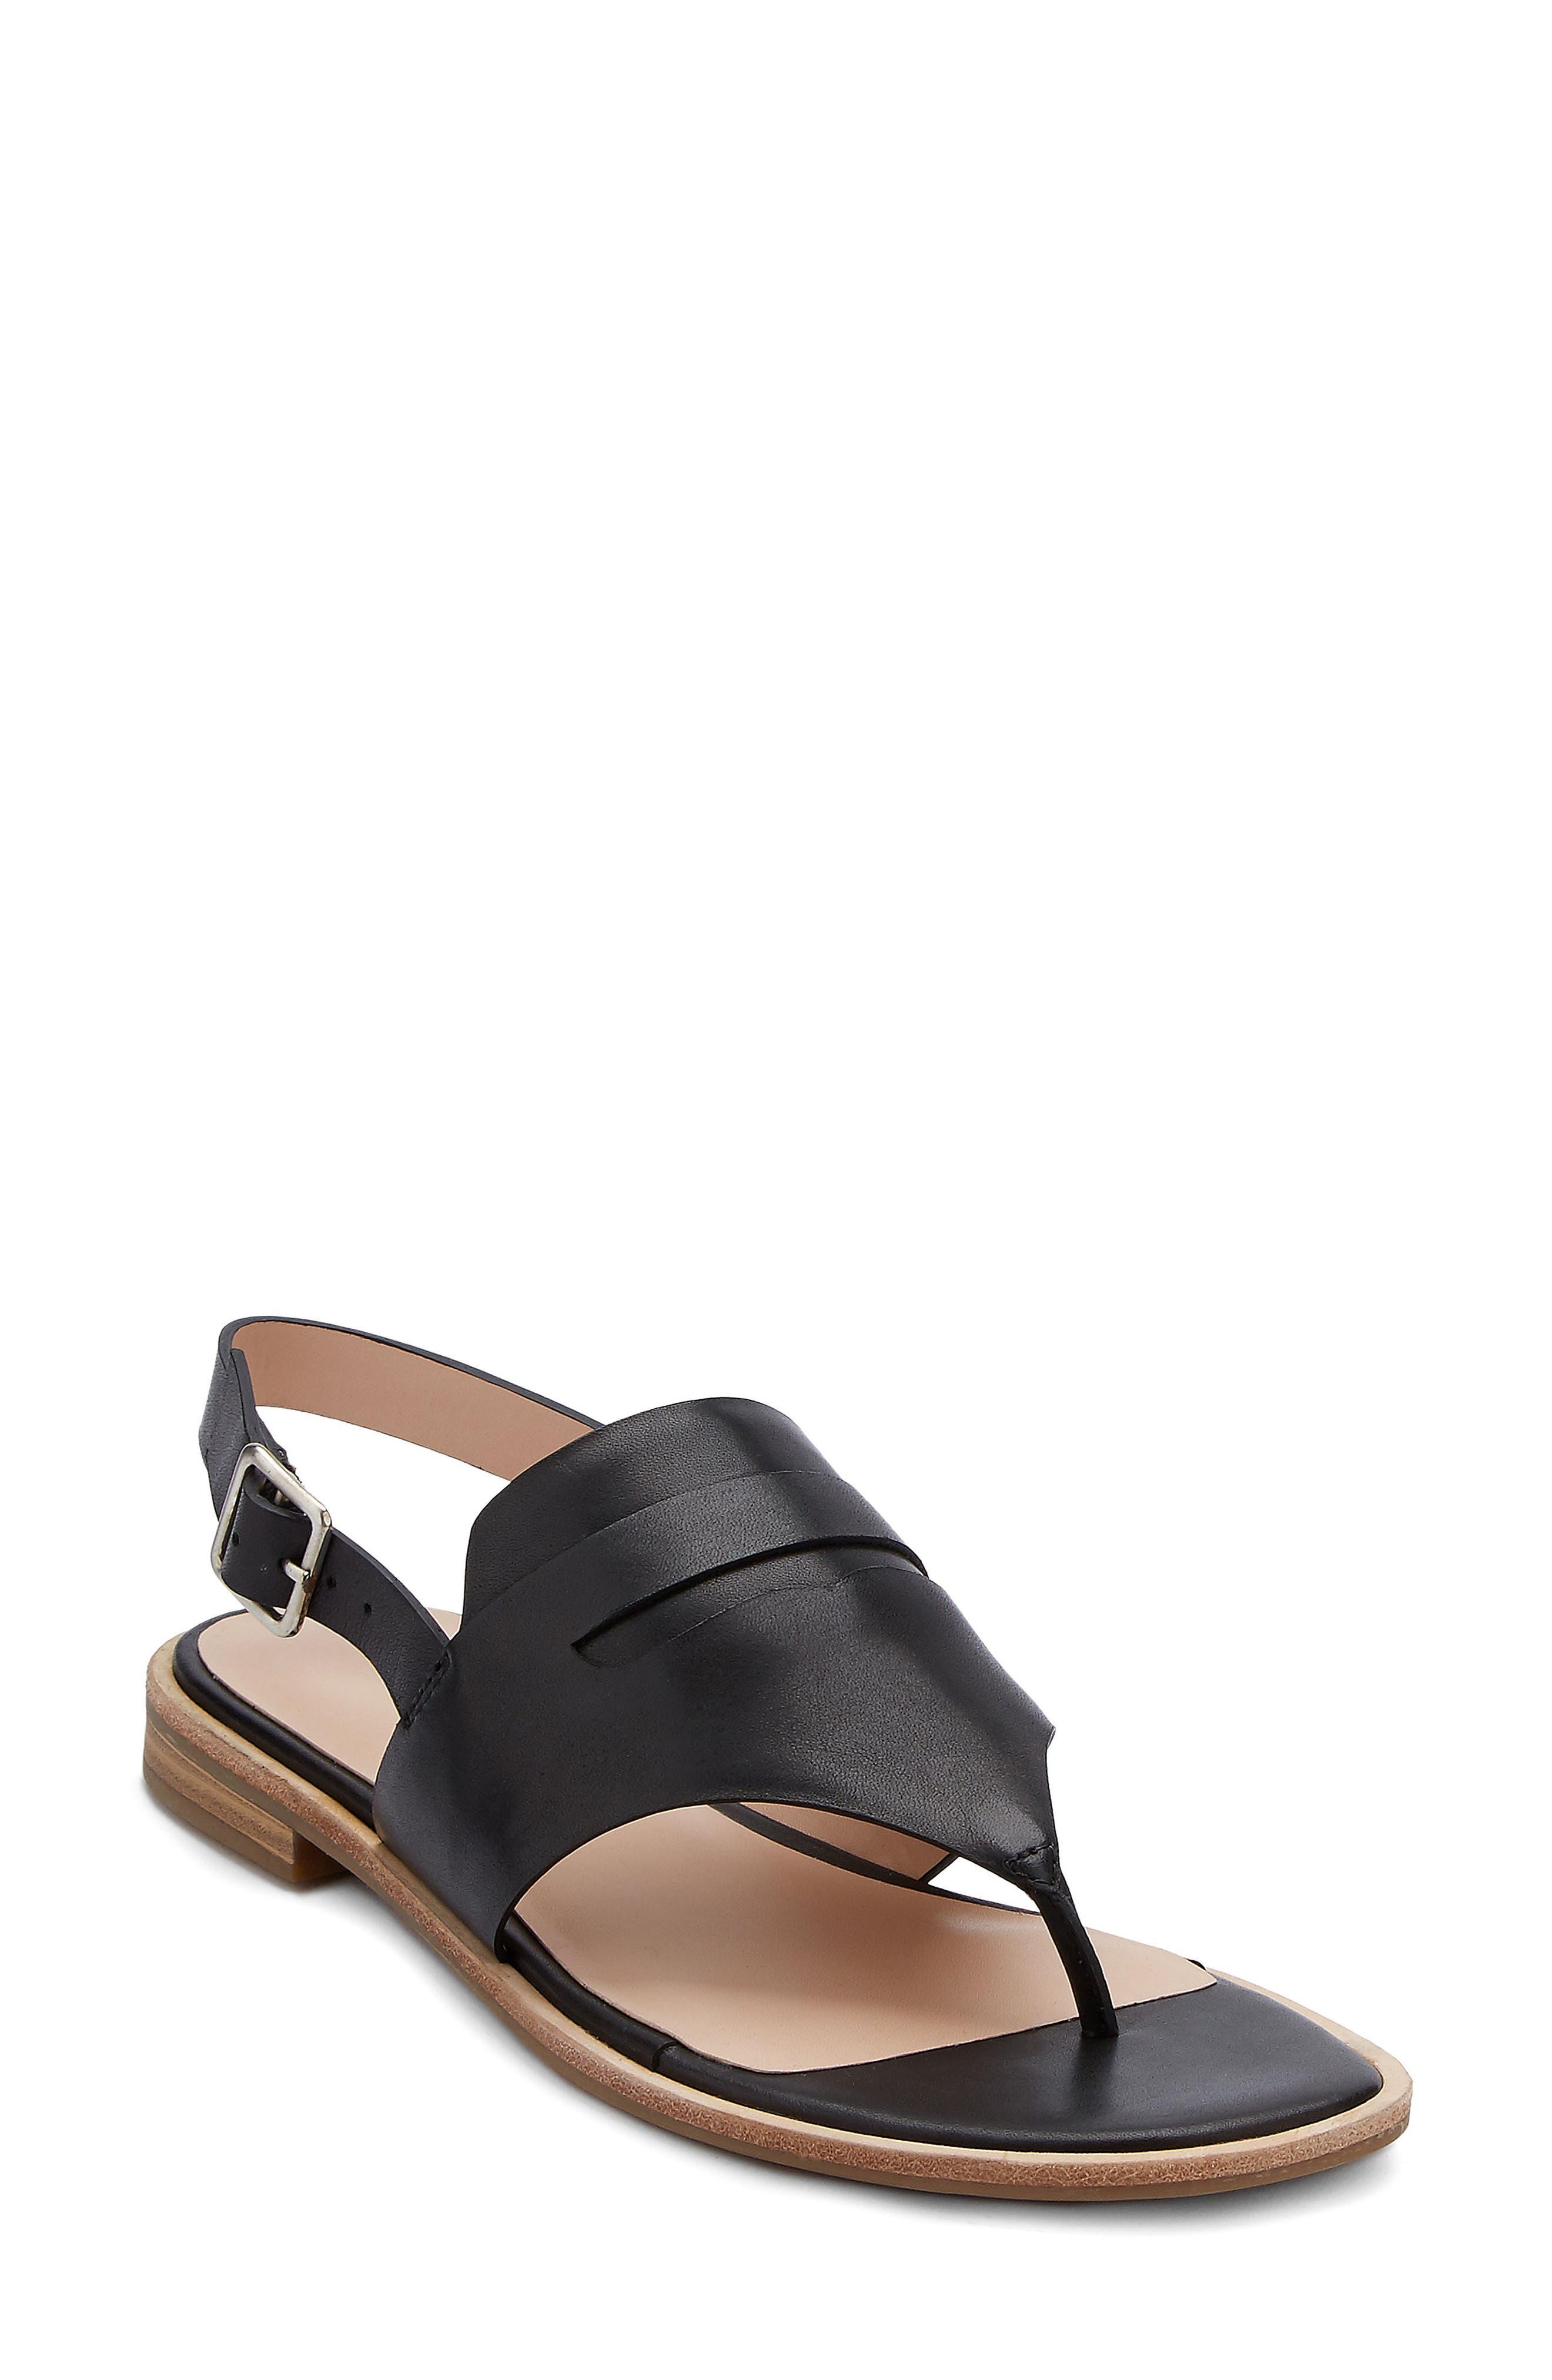 Maddie Slingback Sandal,                         Main,                         color, 001